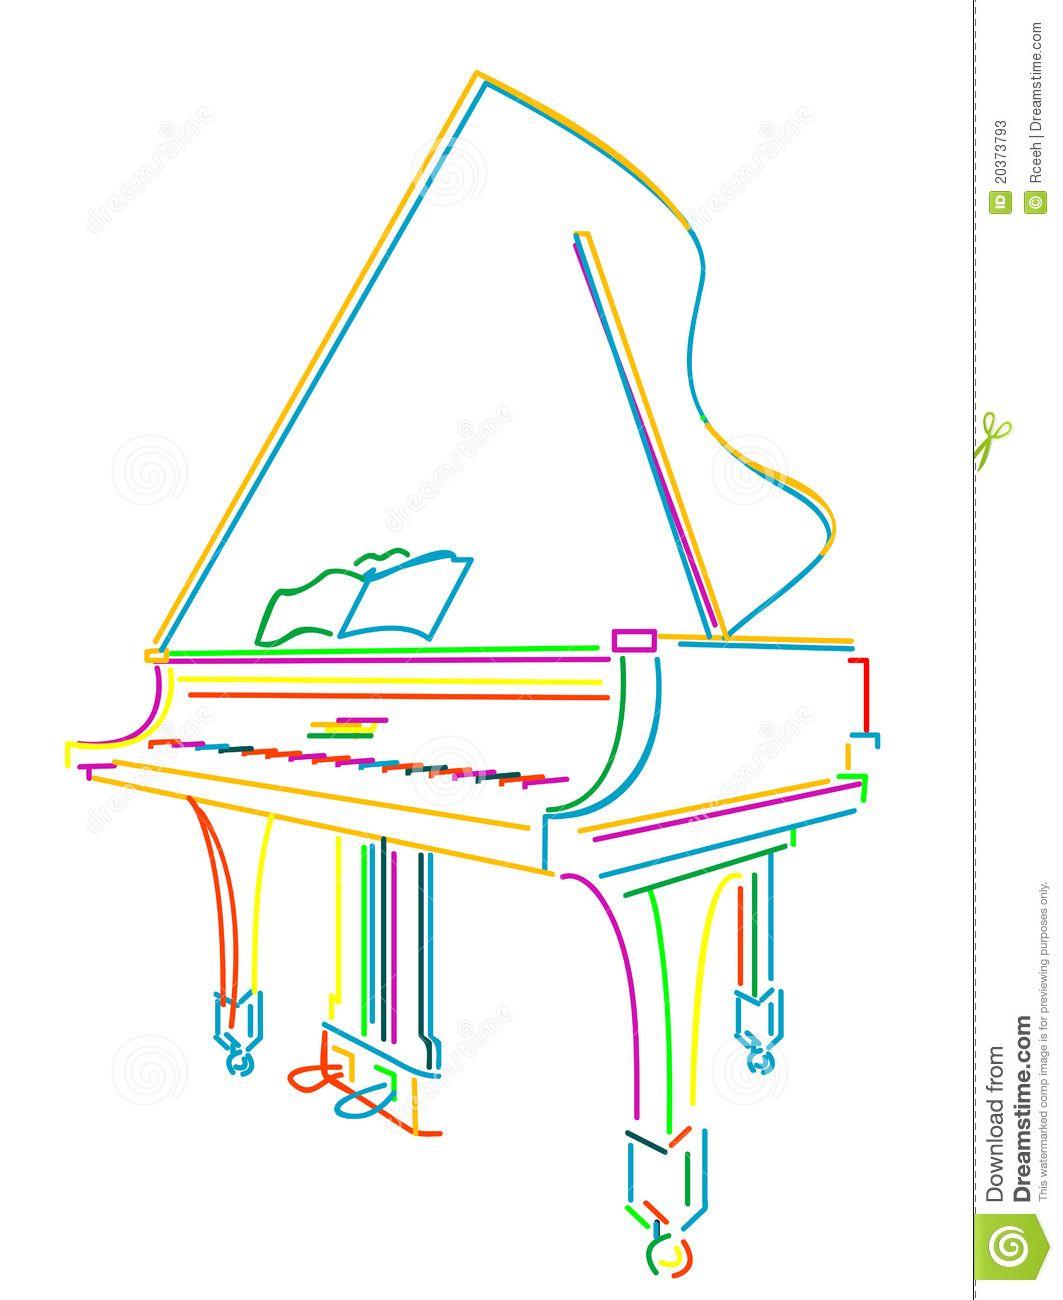 Grand Piano Over White 20373793 Jpg 1063 1300 Baby Grand Pianos Piano Baby Colors